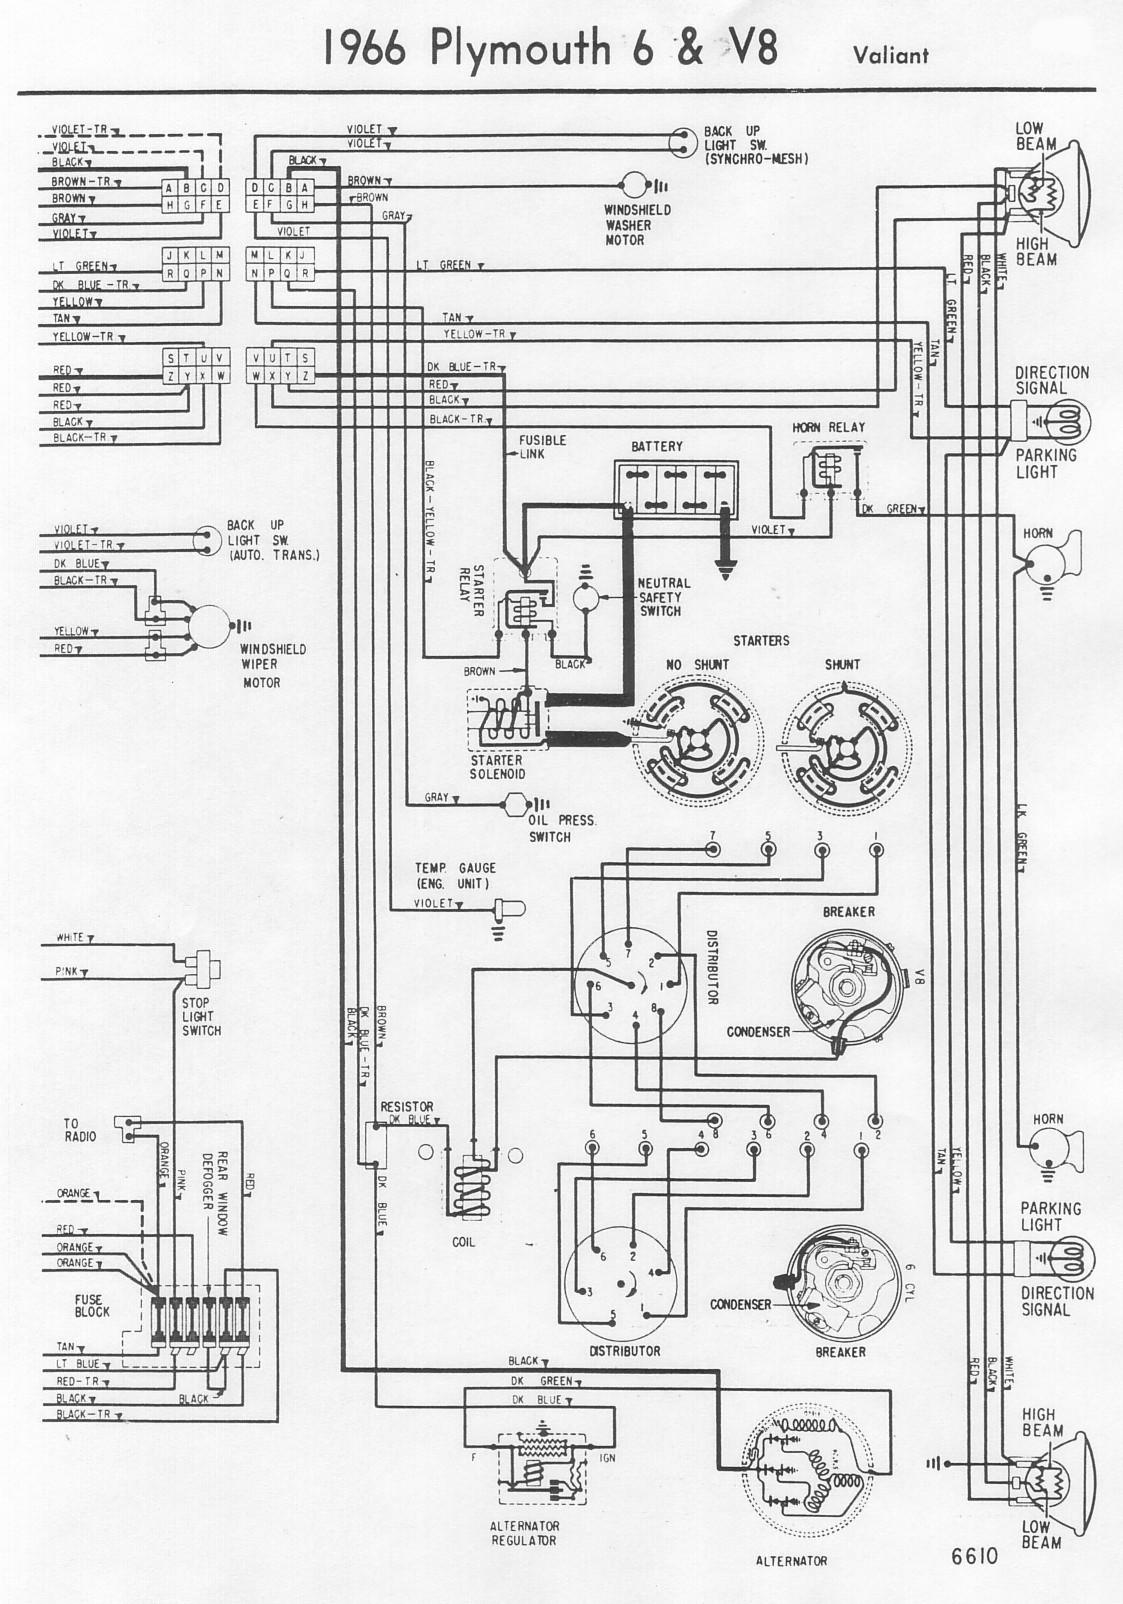 97 Softail Wiring Diagram in addition Tao 110cc Wiring Diagram Headlight additionally 89 Honda Goldwing Aux Switch Wiring Diagram likewise Honda Civic Radio Wiring Diagram On 2002 400ex also Alternator Wiring Diagram For 1996 Honda Accord. on chevy wiring diagrams 125 jpg